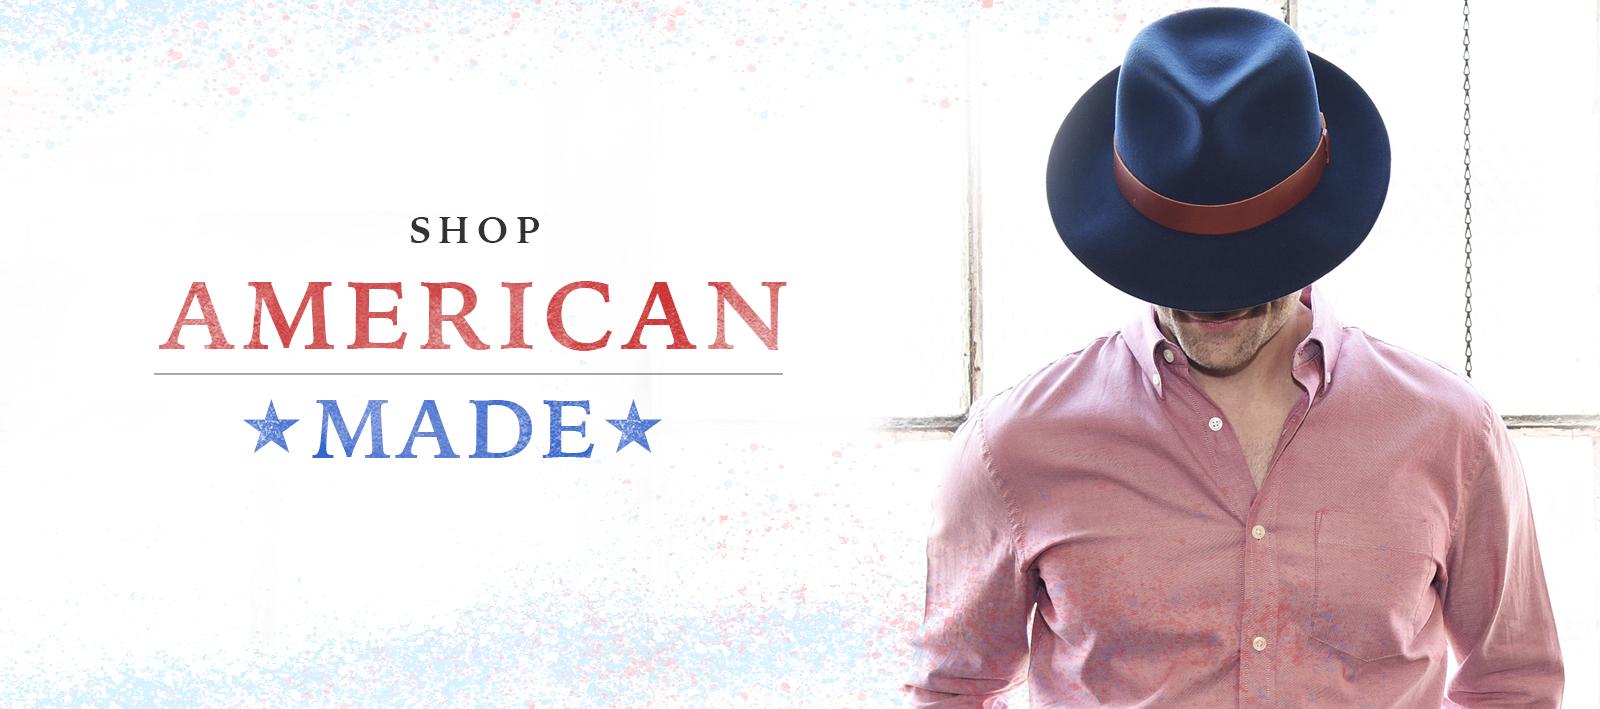 Shop American Made!